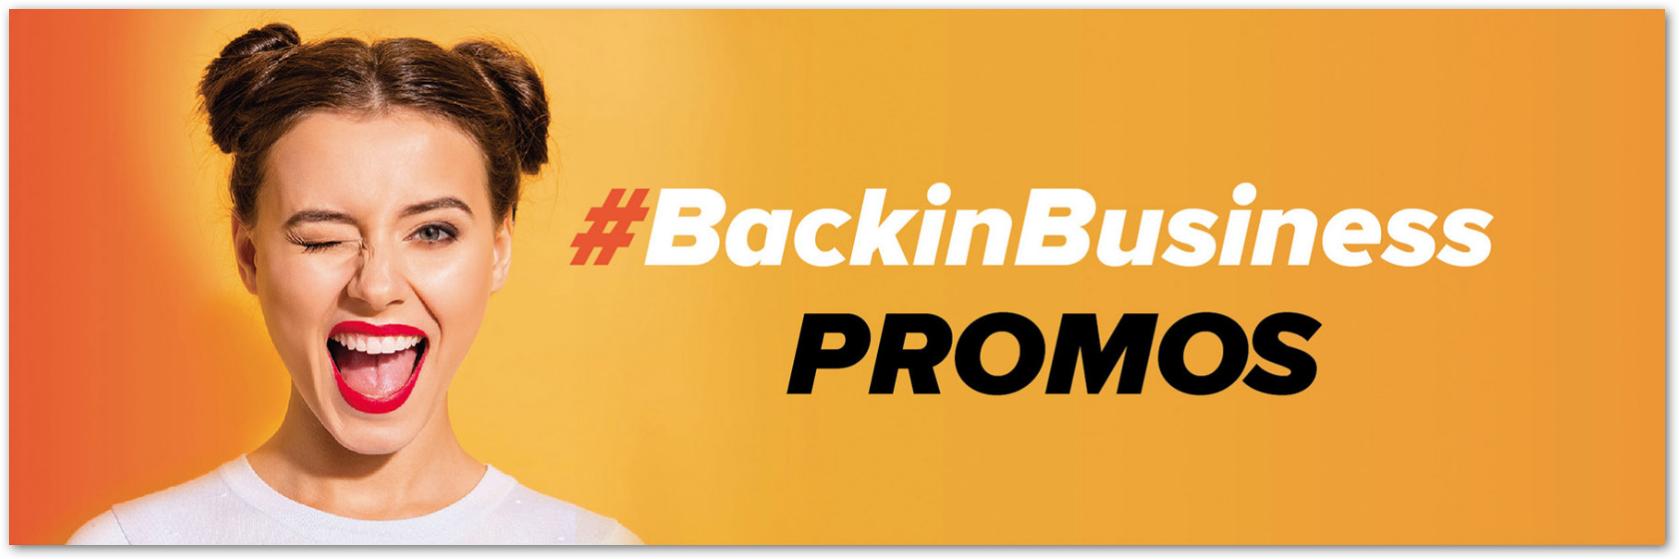 BackInBusiness glavni web banner s senco